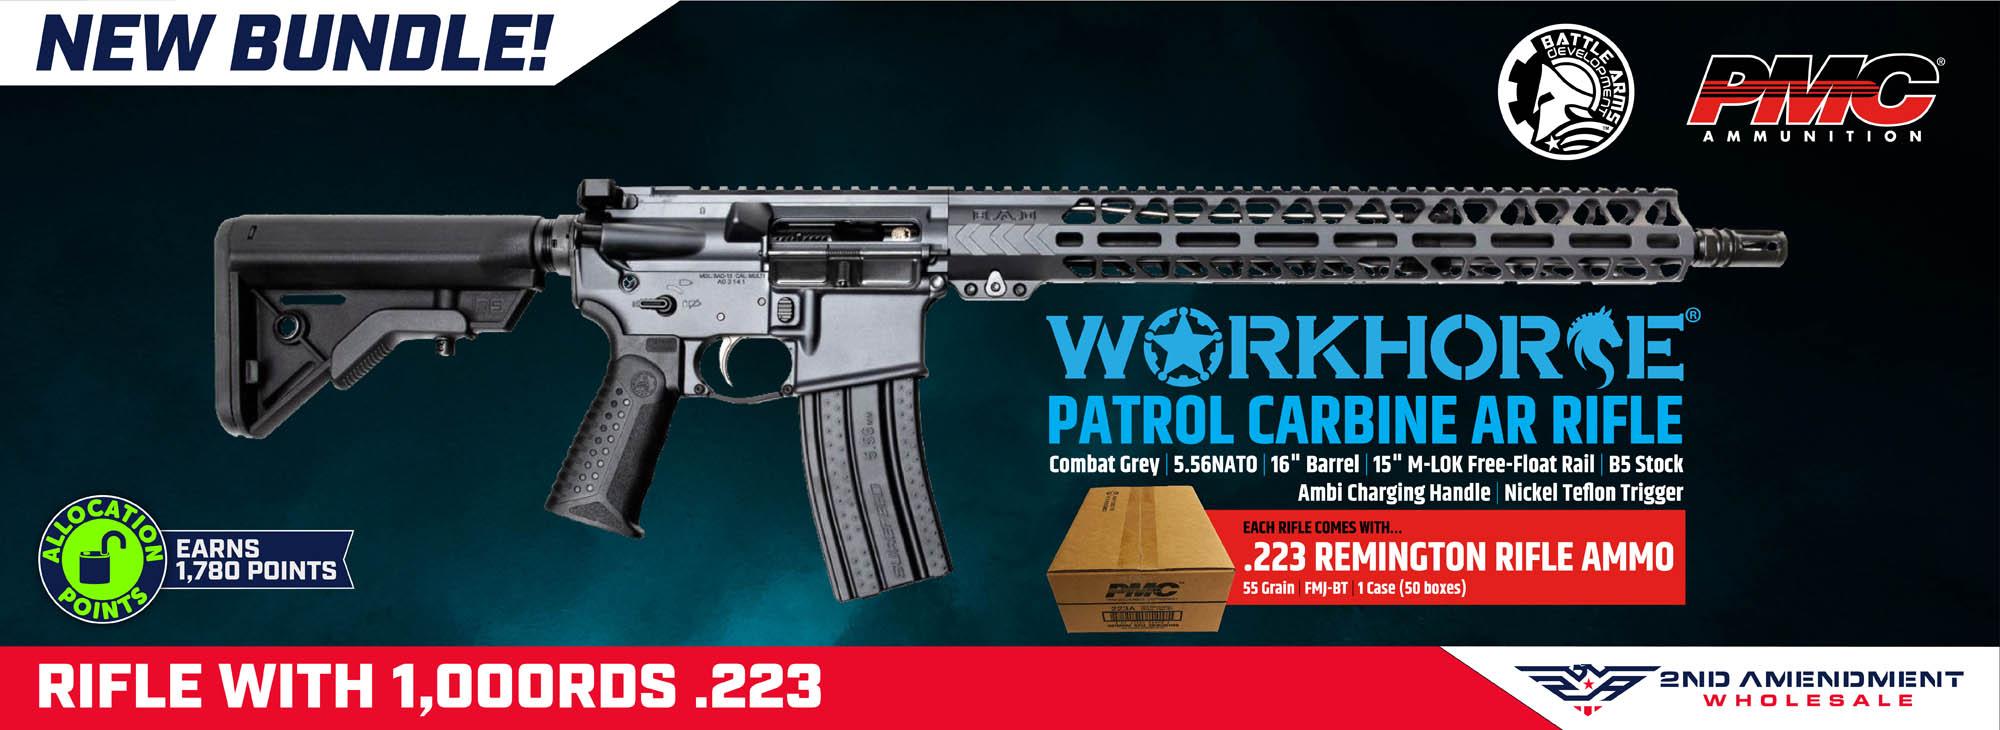 "Battle Arms Development Forged WORKHORSE Patrol Carbine AR Rifle - Combat Grey | 5.56NATO | 16"" Barrel | 15"" M-LOK Rail | Ambi Charging Handle | B5 Stock | Nickel Teflon Trigger & PMC Bronze .223 Rem Rifle Ammo - 55 Grain | FMJ-BT | 1 Case (50 boxes)"